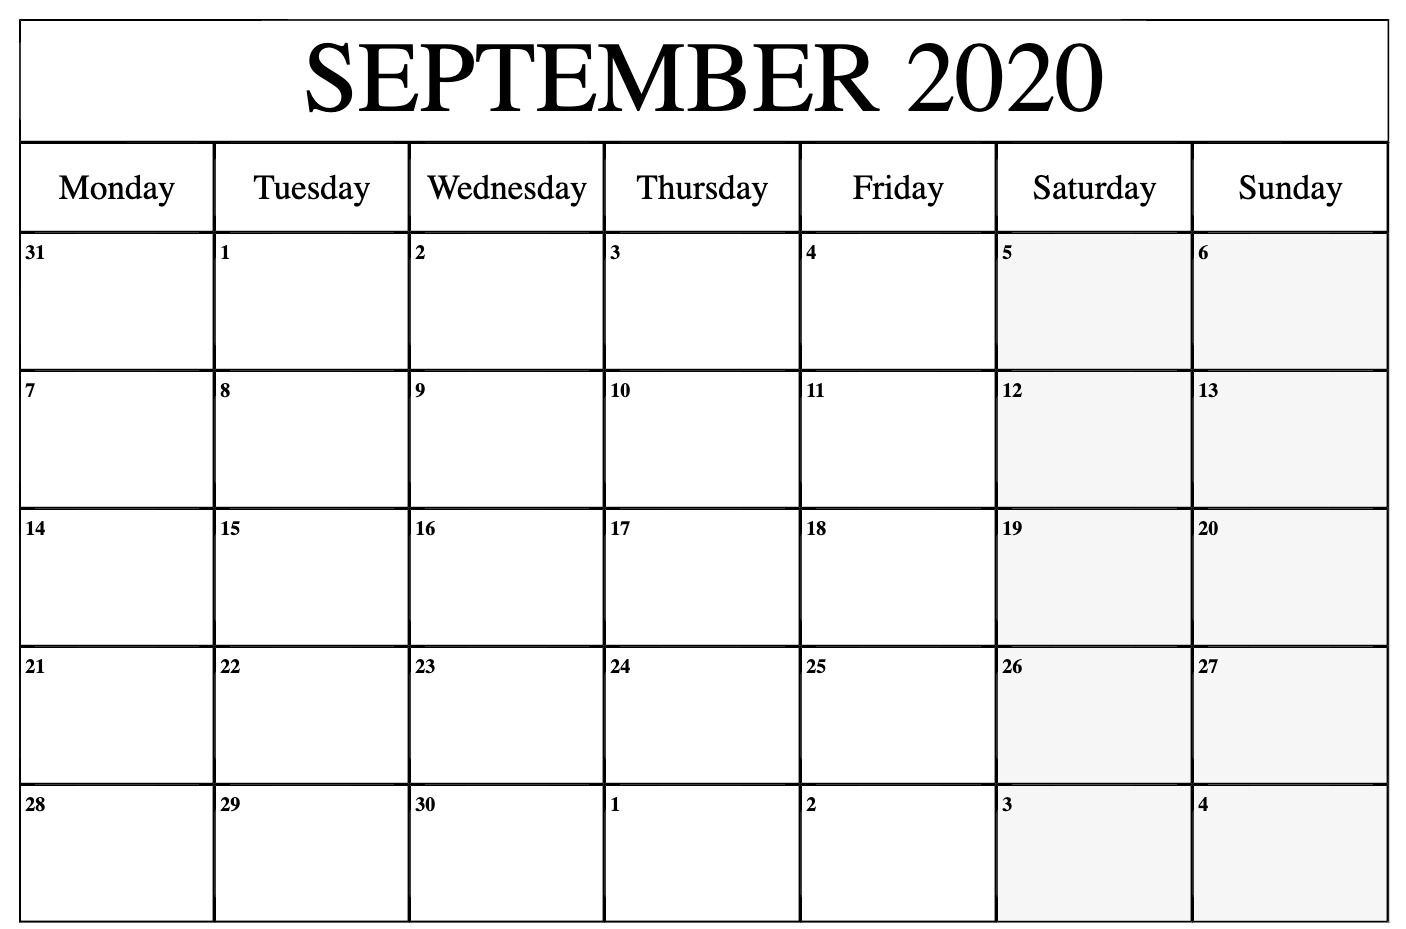 Print September 2020 Calendar To Print | September Calendars